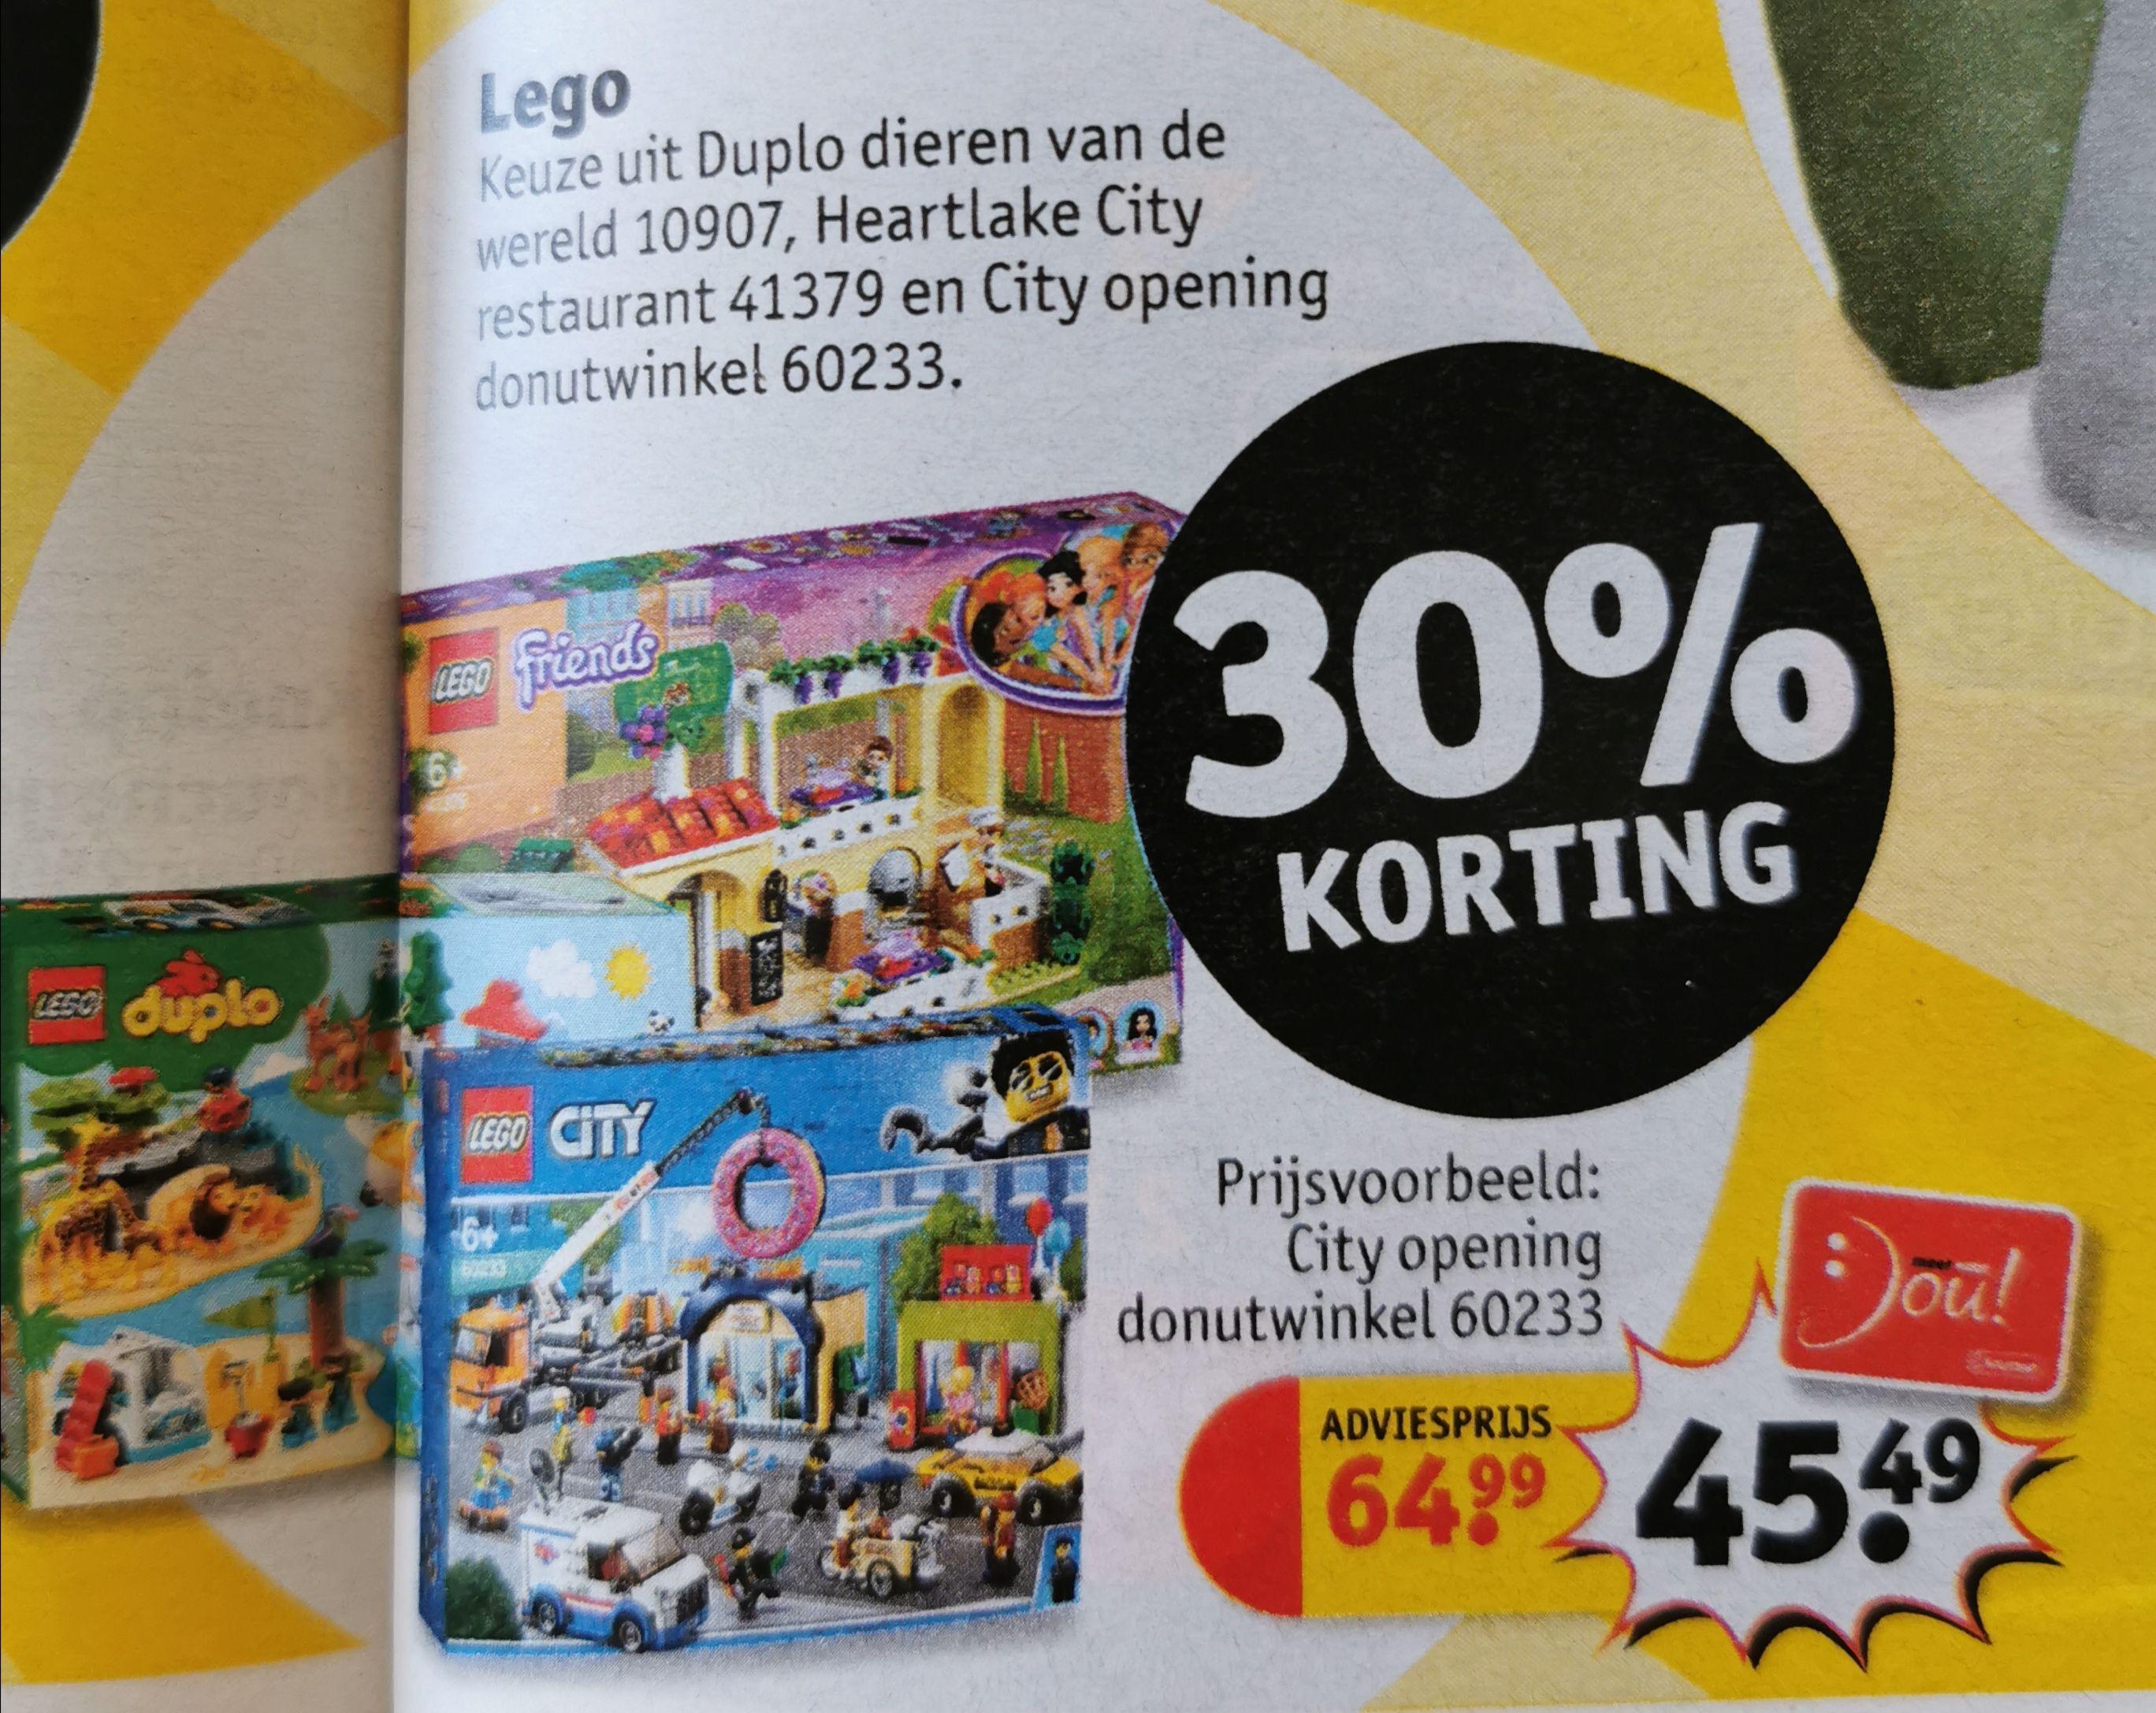 Lego City Donutwinkel 30%korting, nu € 45,49 @ Kruidvat